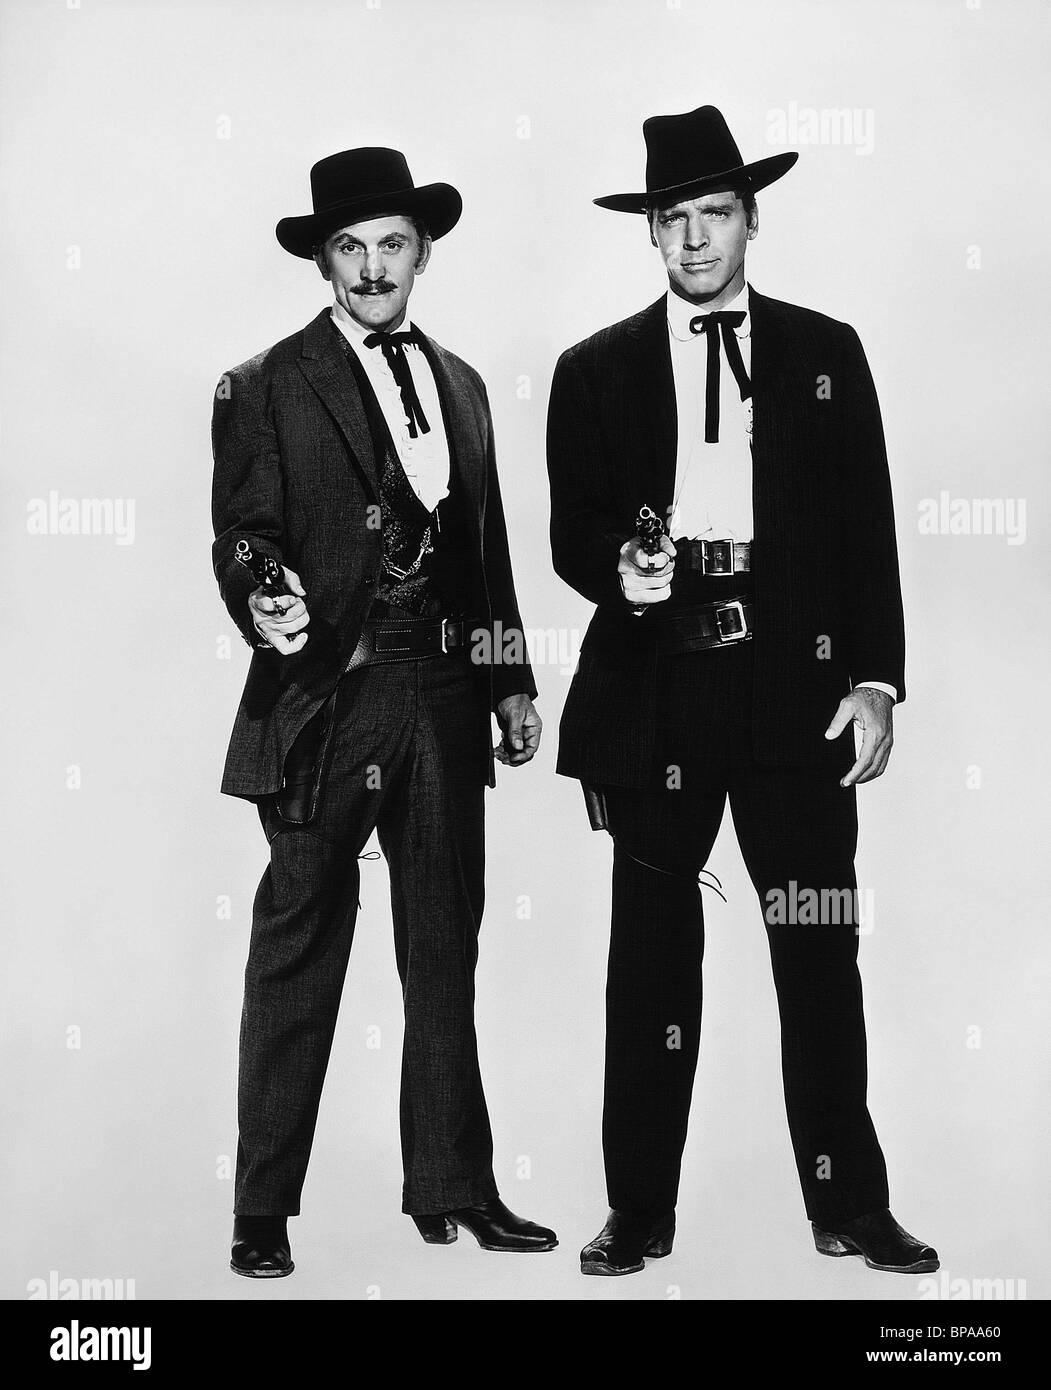 KIRK DOUGLAS & BURT LANCASTER GUNFIGHT AT THE O.K. CORRAL; GUNFIGHT AT THE OK CORRAL (1957)